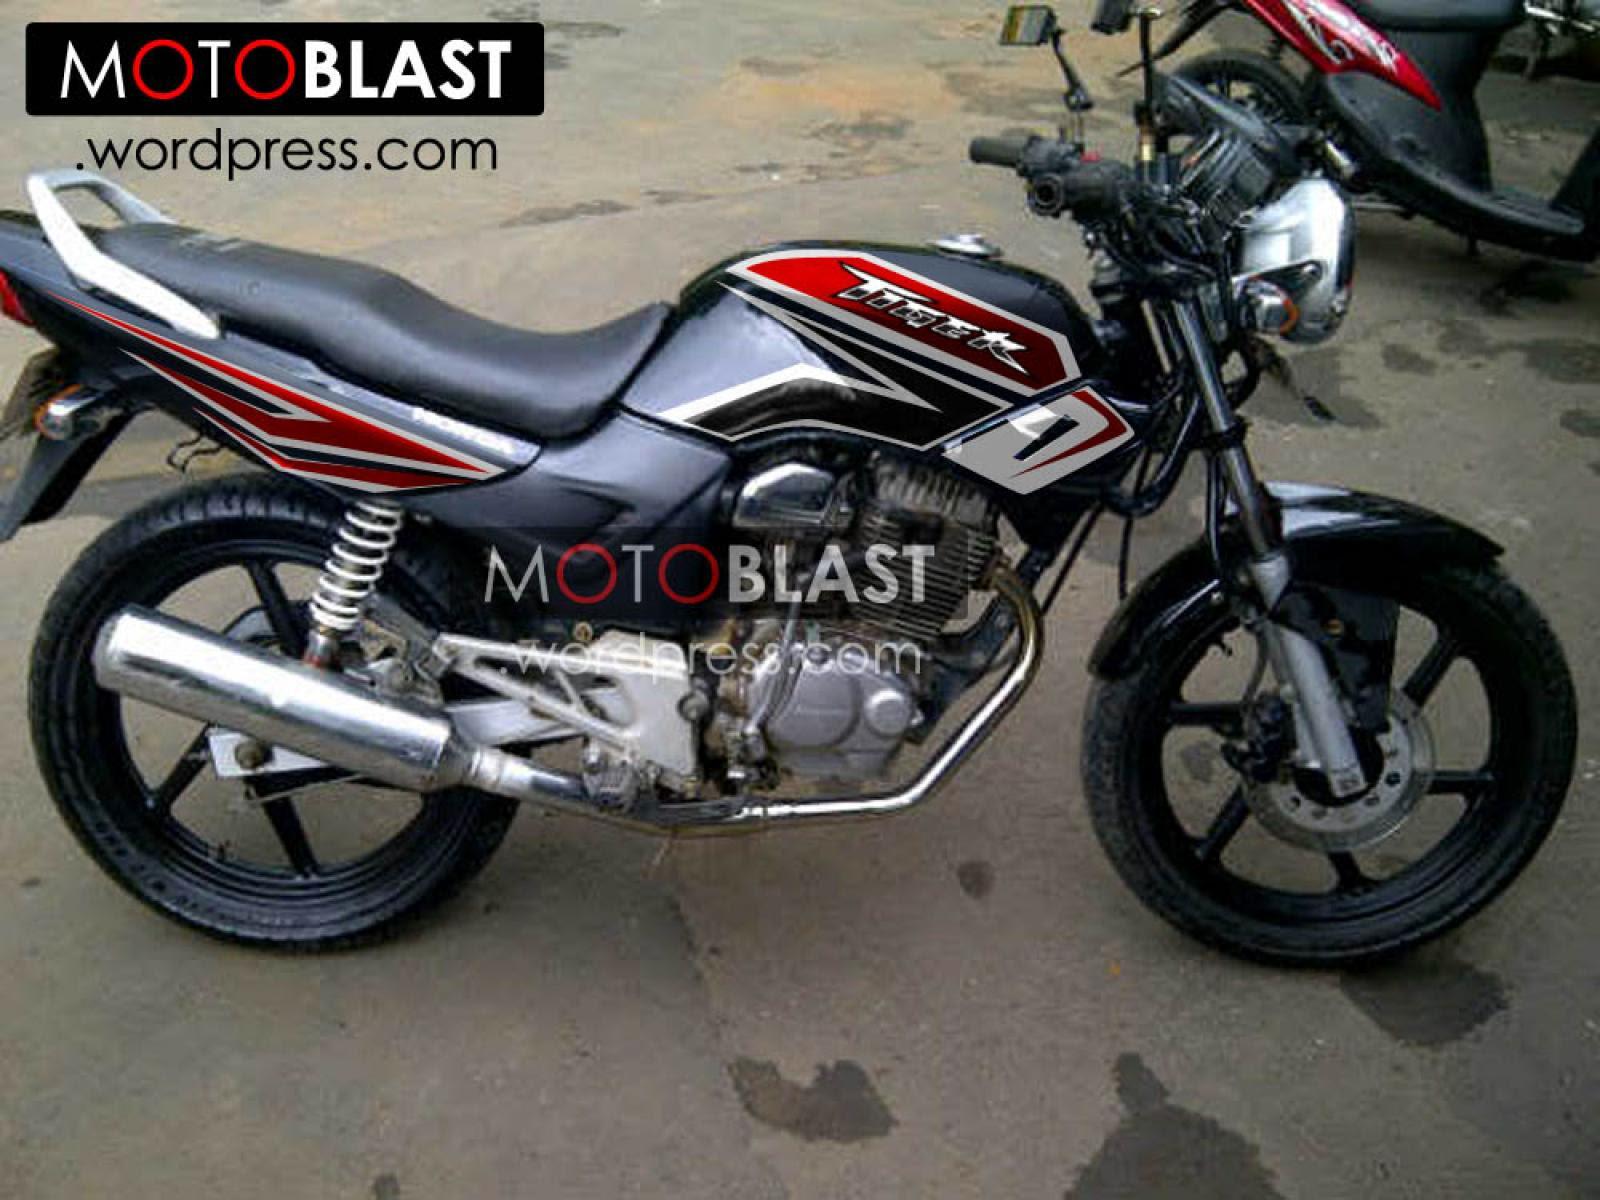 Kumpulan Harga Modifikasi Motor Tiger 2000 Terlengkap Dinding Motor